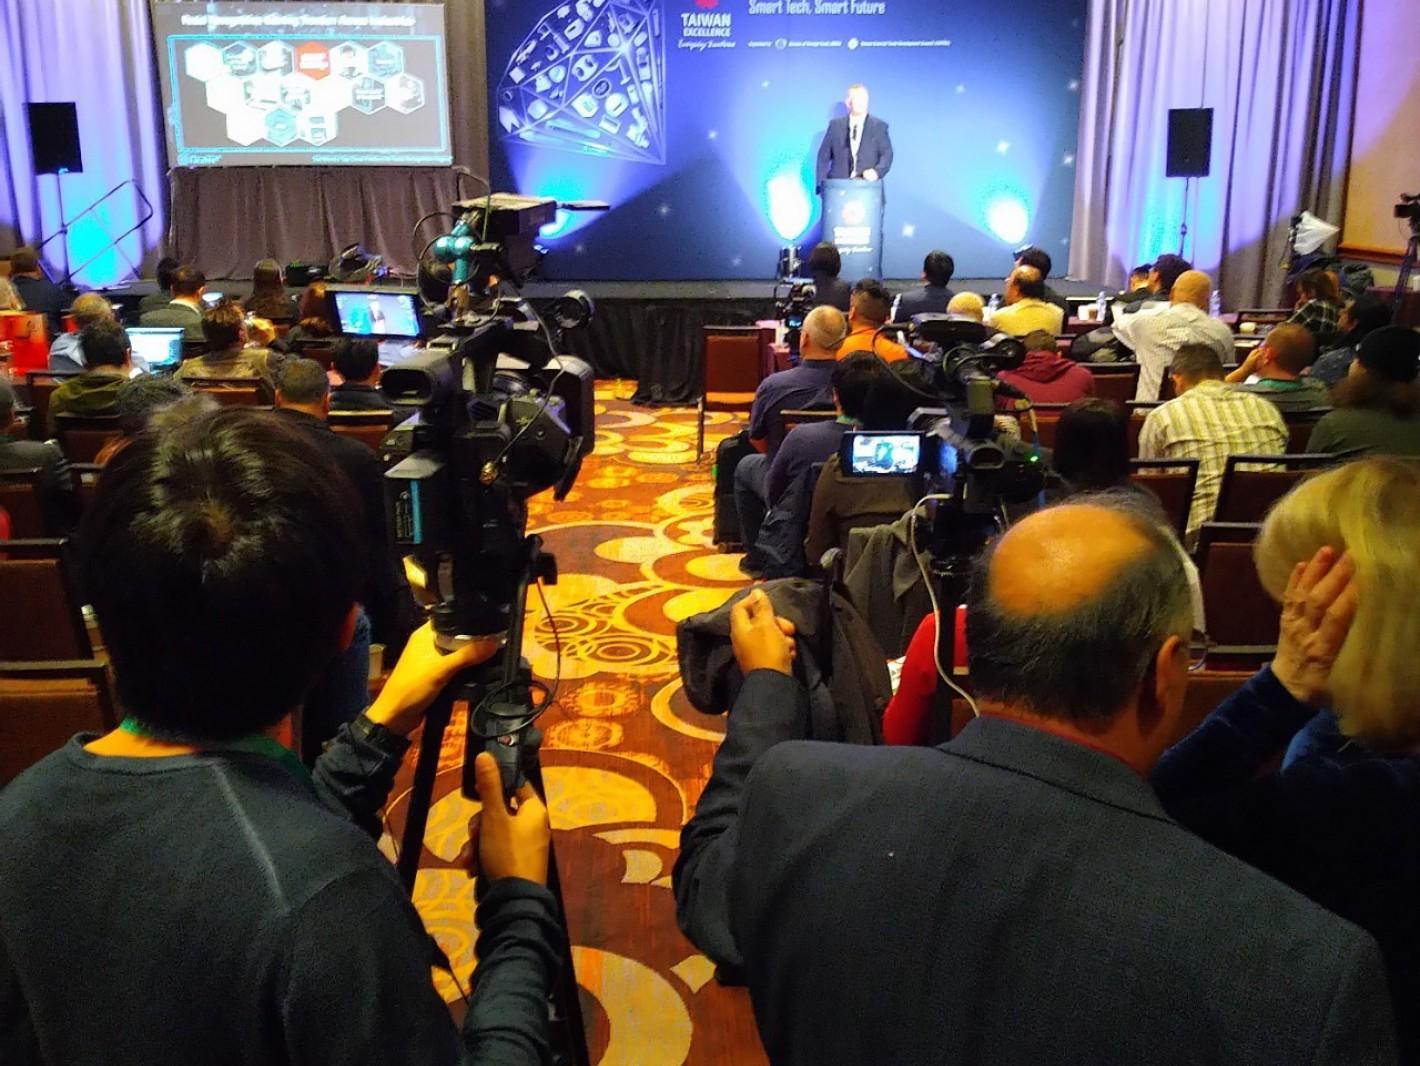 CES 2020 台灣精品展前記者會吸引14國110名媒體及產業代表參加